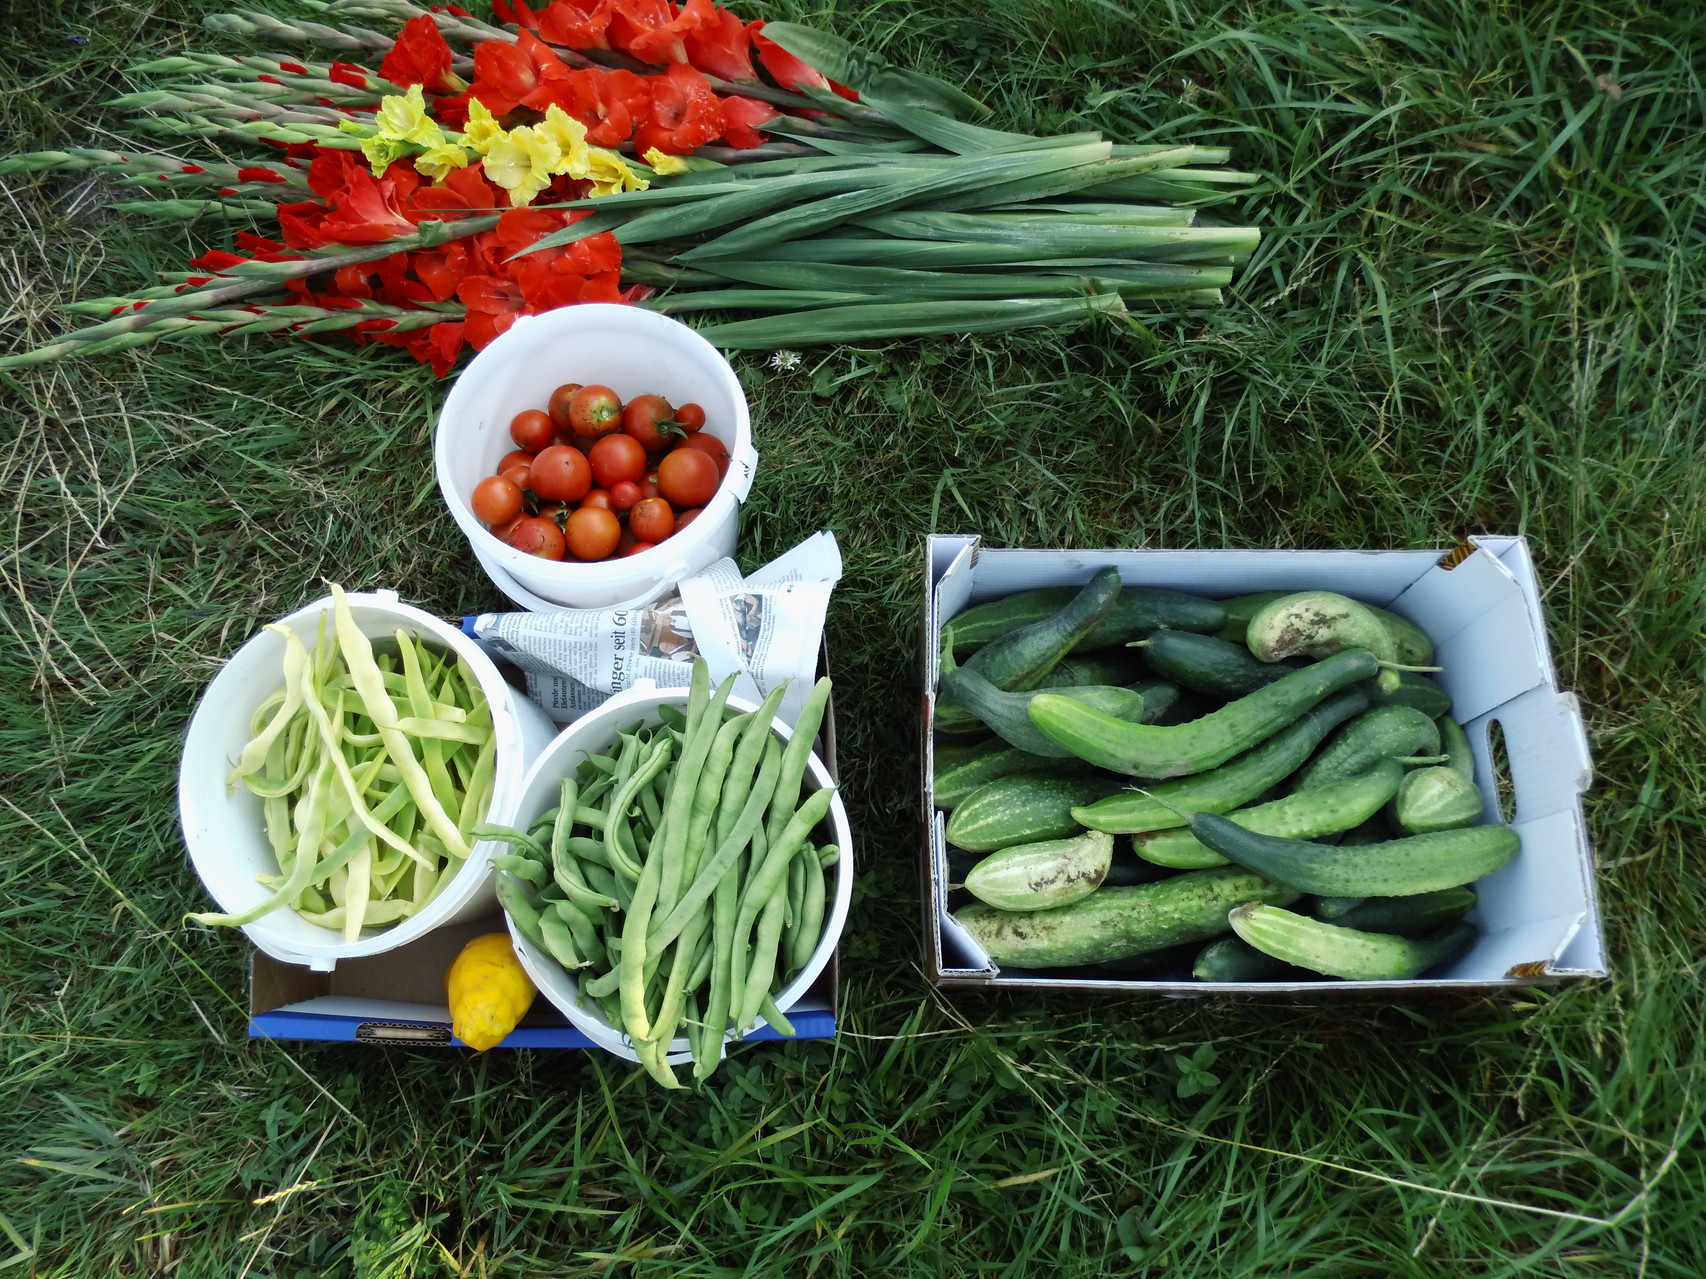 Bohnen, Tomaten, Gurken frisch gepflückt